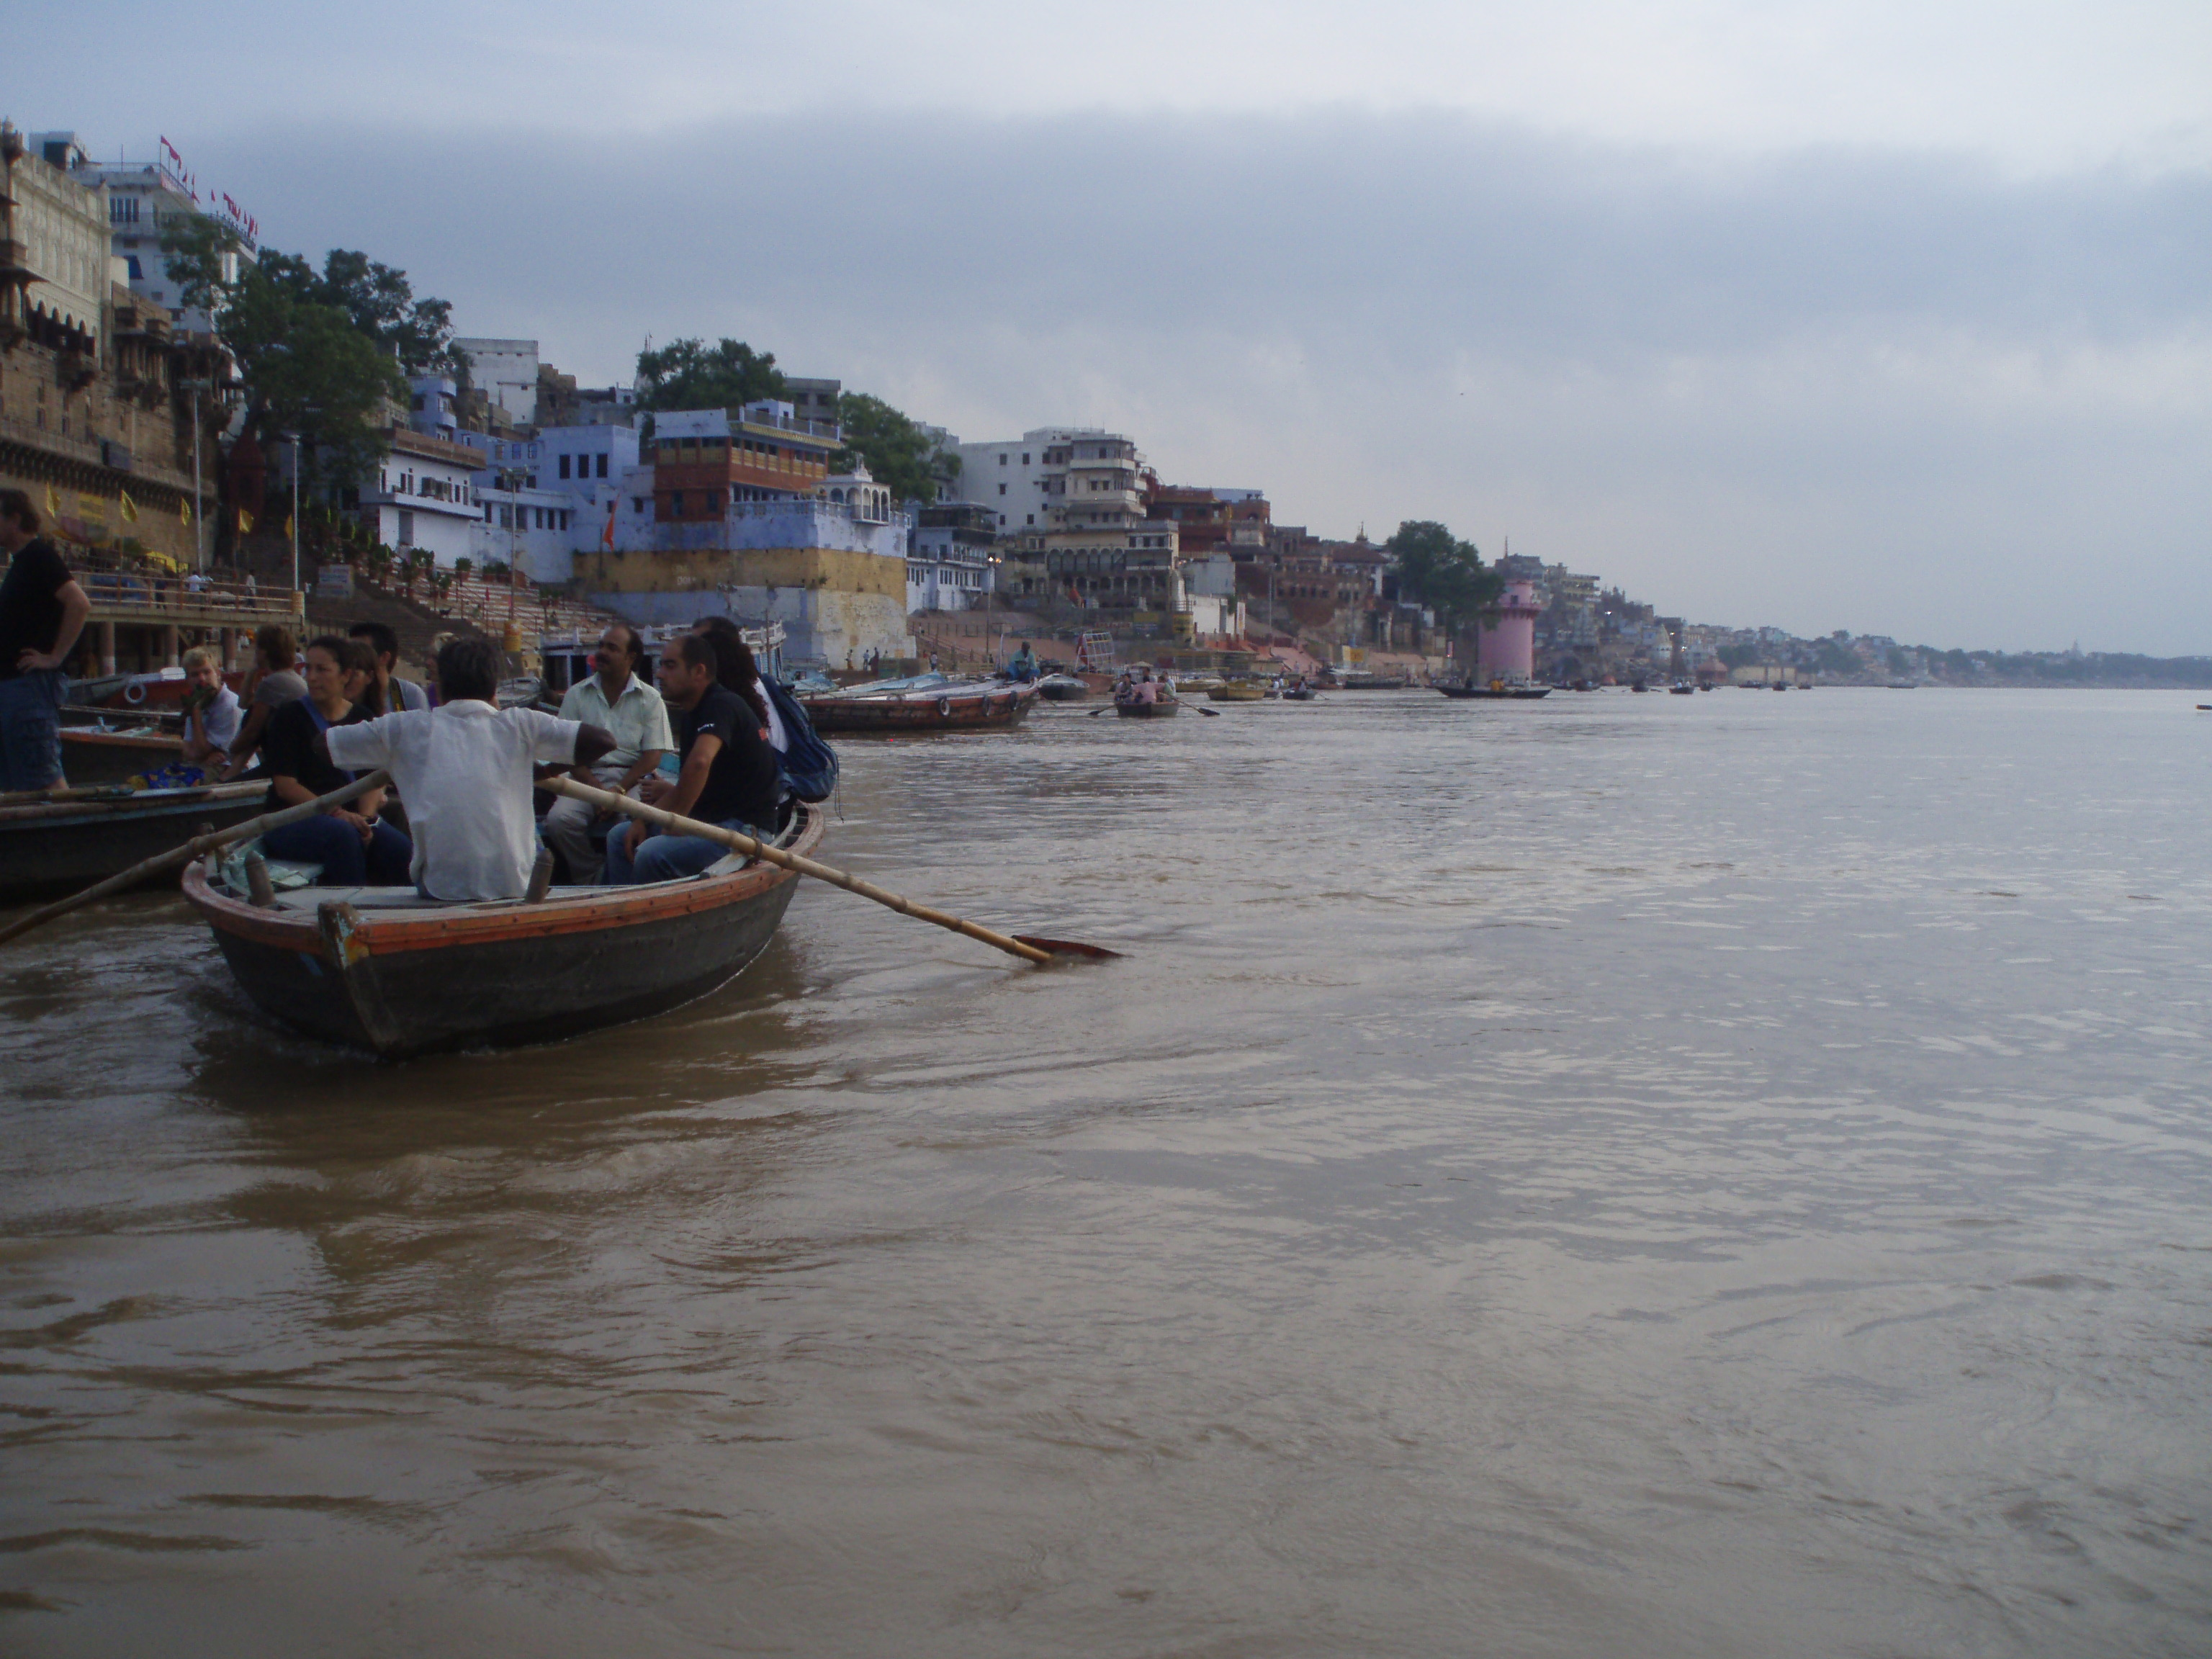 Amanecer en el Ganges @Doris Casares